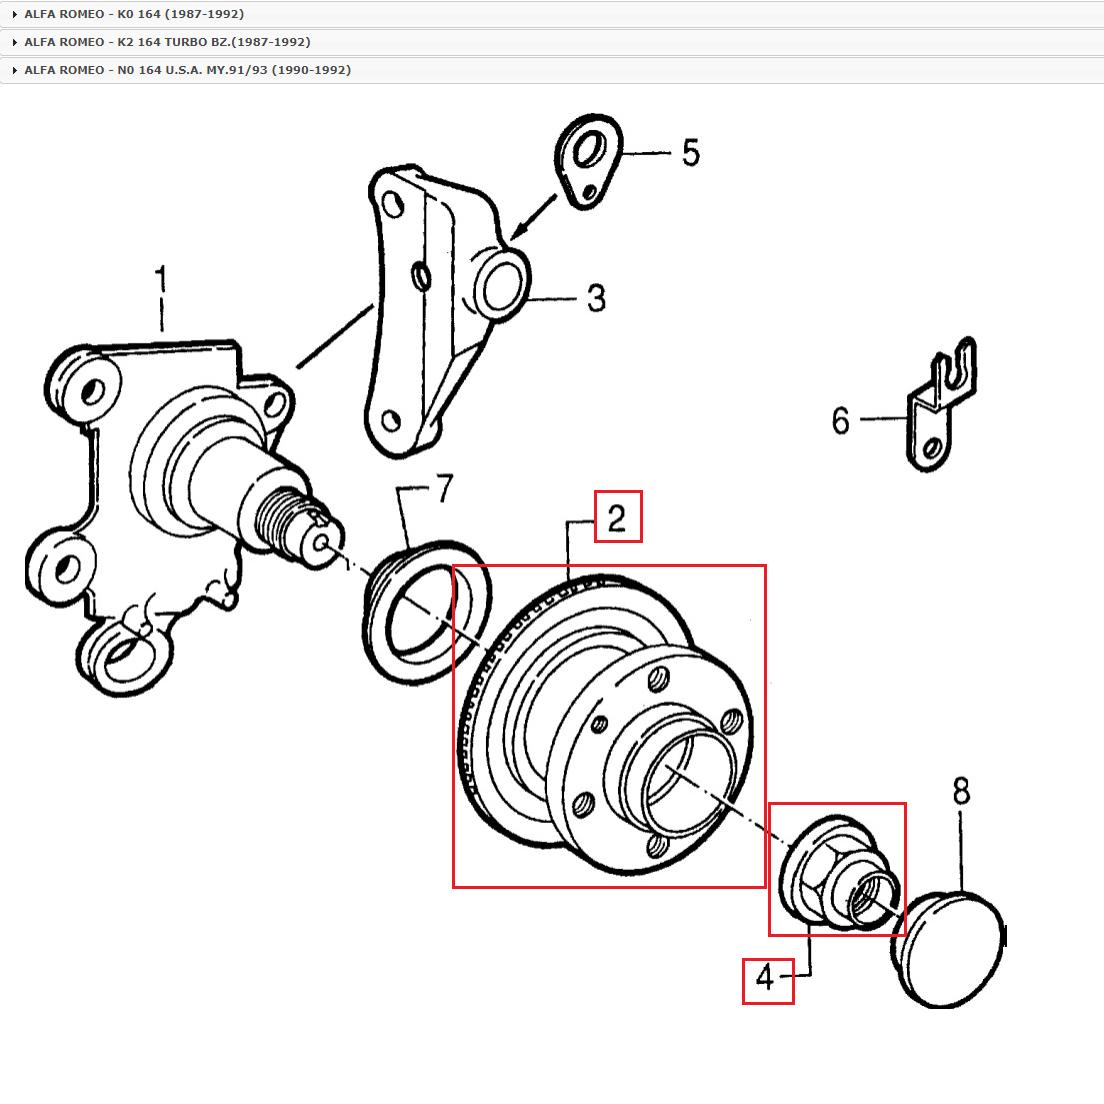 Alfa Romeo 164 Wiring Diagram